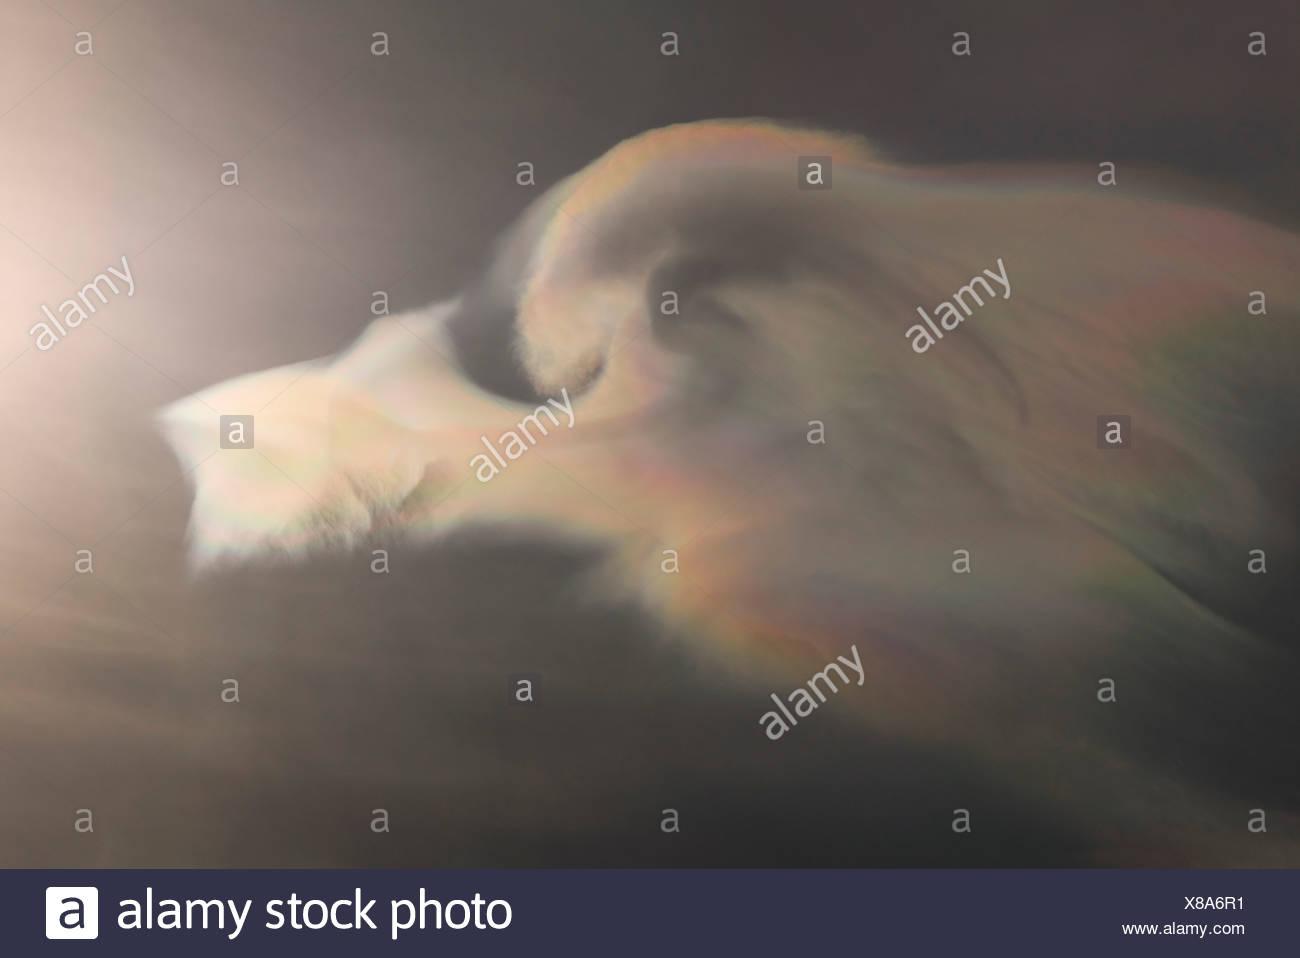 Backlit cloud showing interference lighting phenomenon - Stock Image